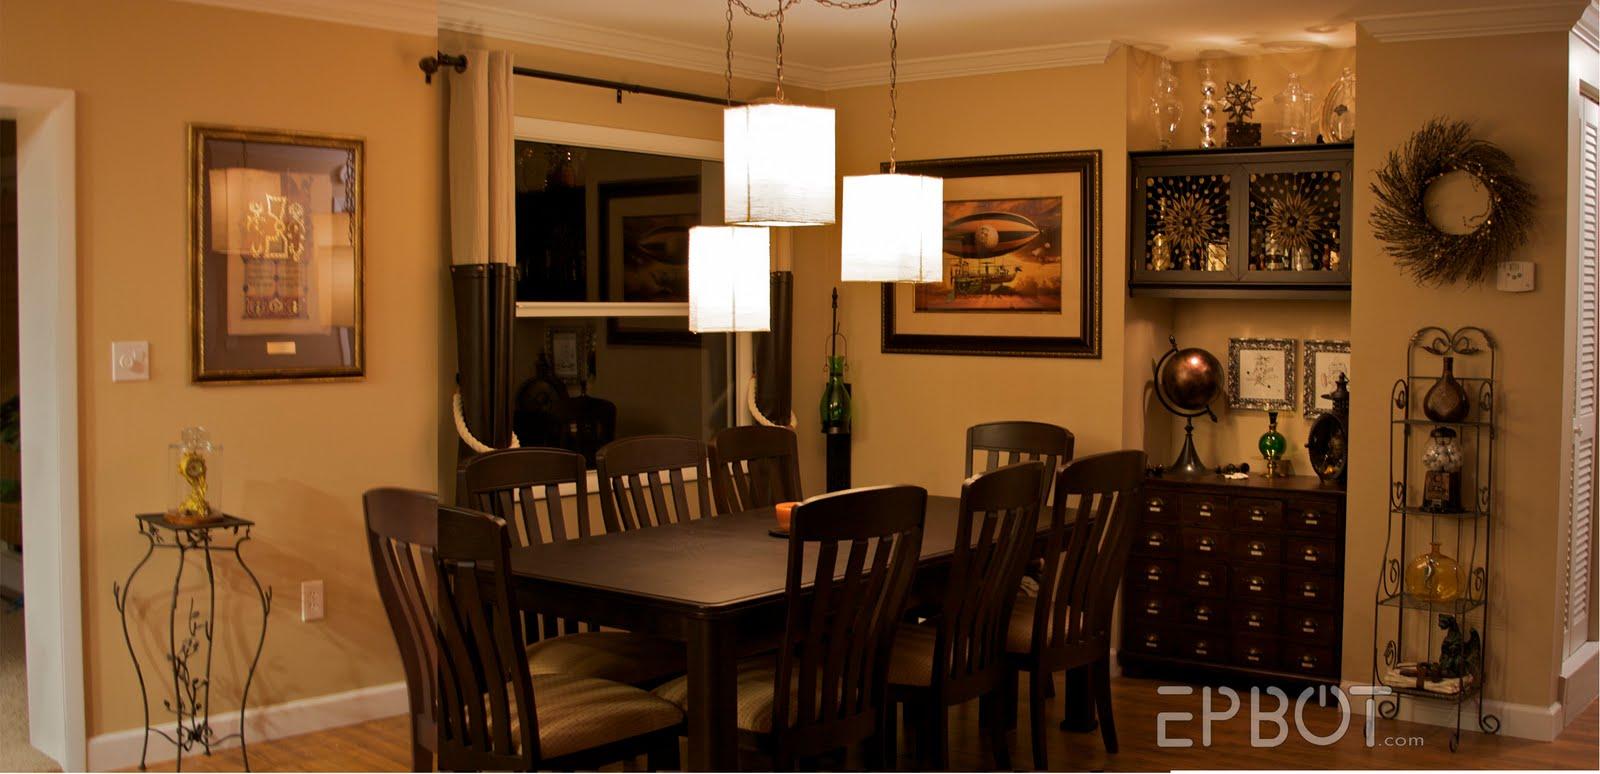 EPBOT: My Steampunk Dining Room